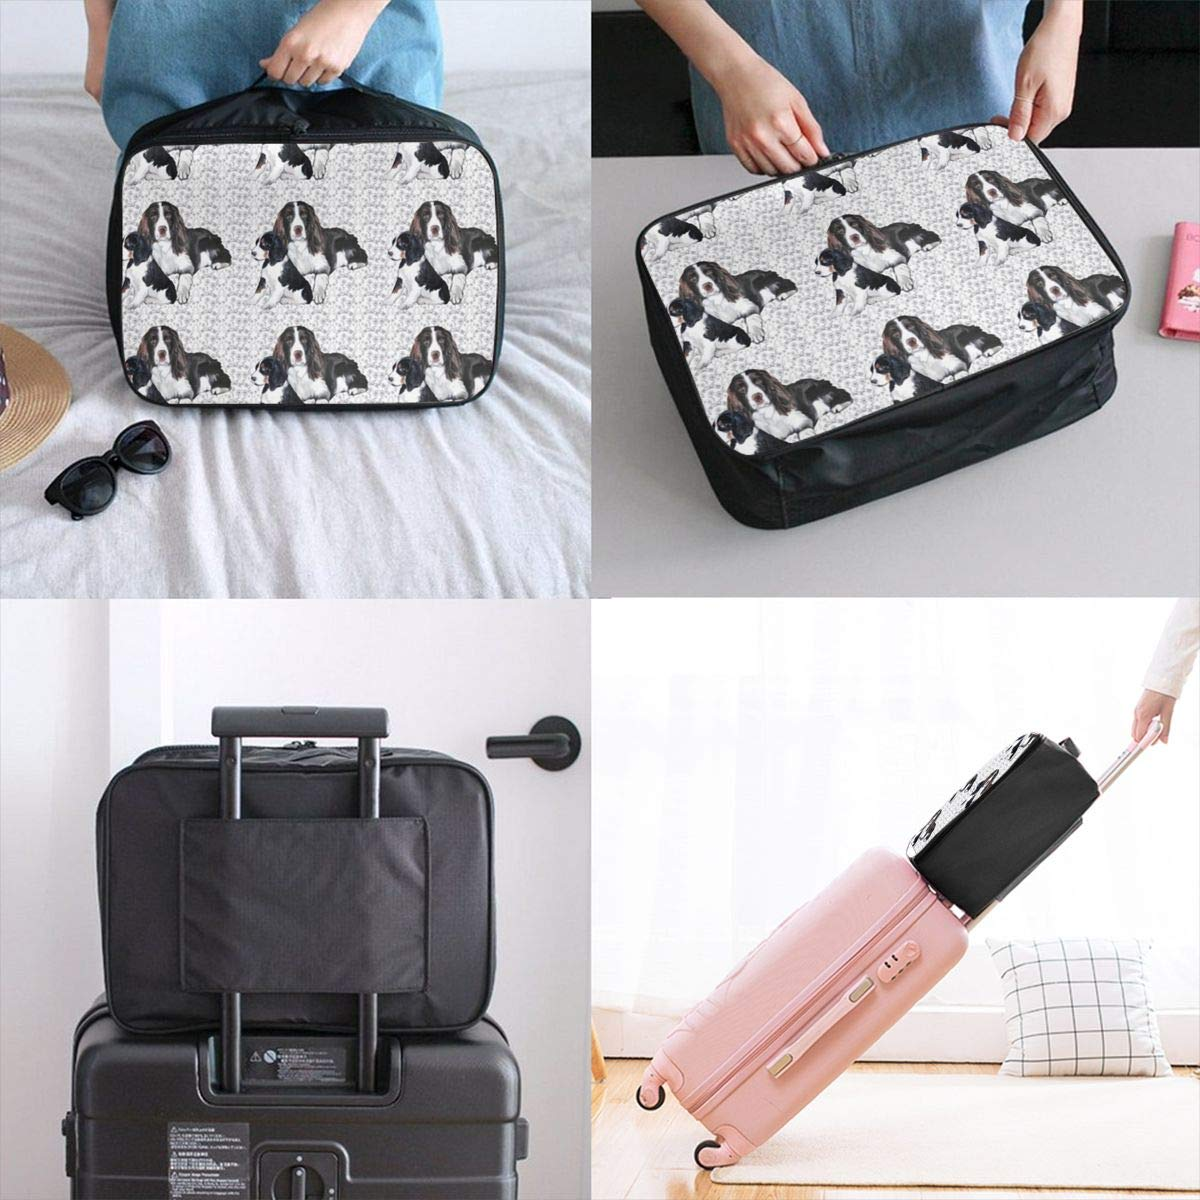 ADGAI Black Labrador Dog Background Stitching Canvas Travel Weekender Bag,Fashion Custom Lightweight Large Capacity Portable Luggage Bag,Suitcase Trolley Bag